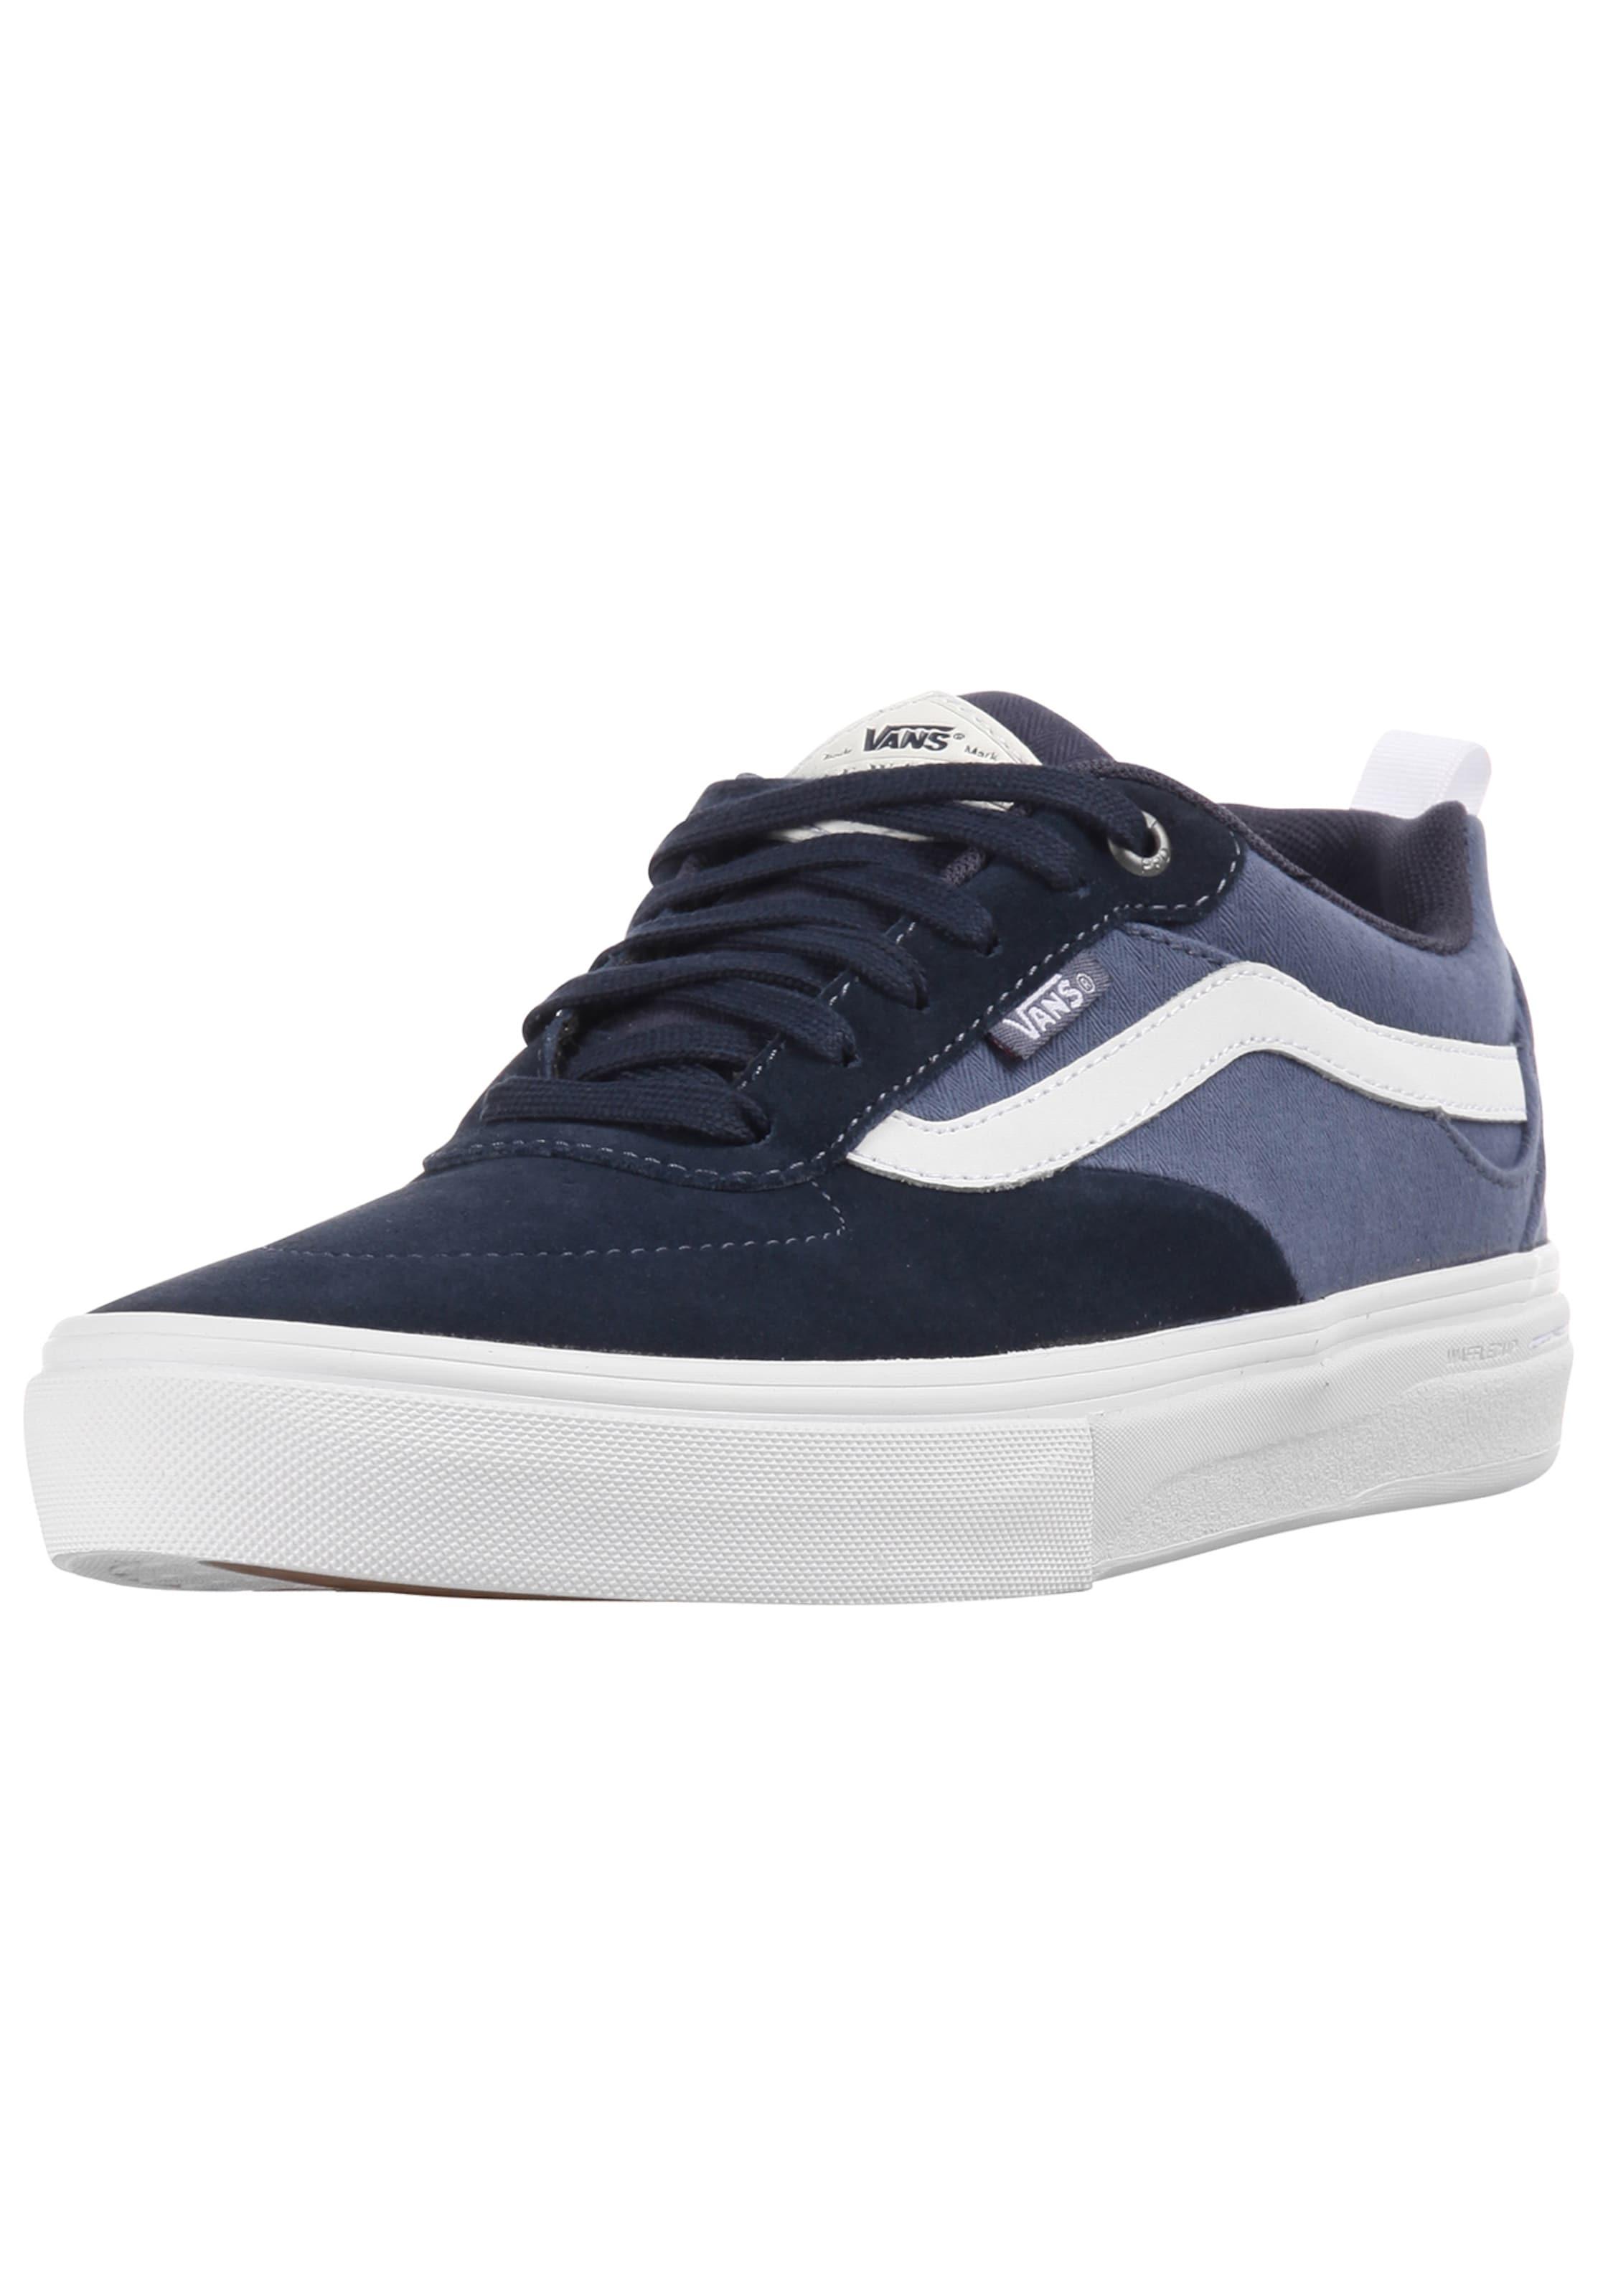 VANS Kyle Walker Pro Sneaker Hohe Qualität